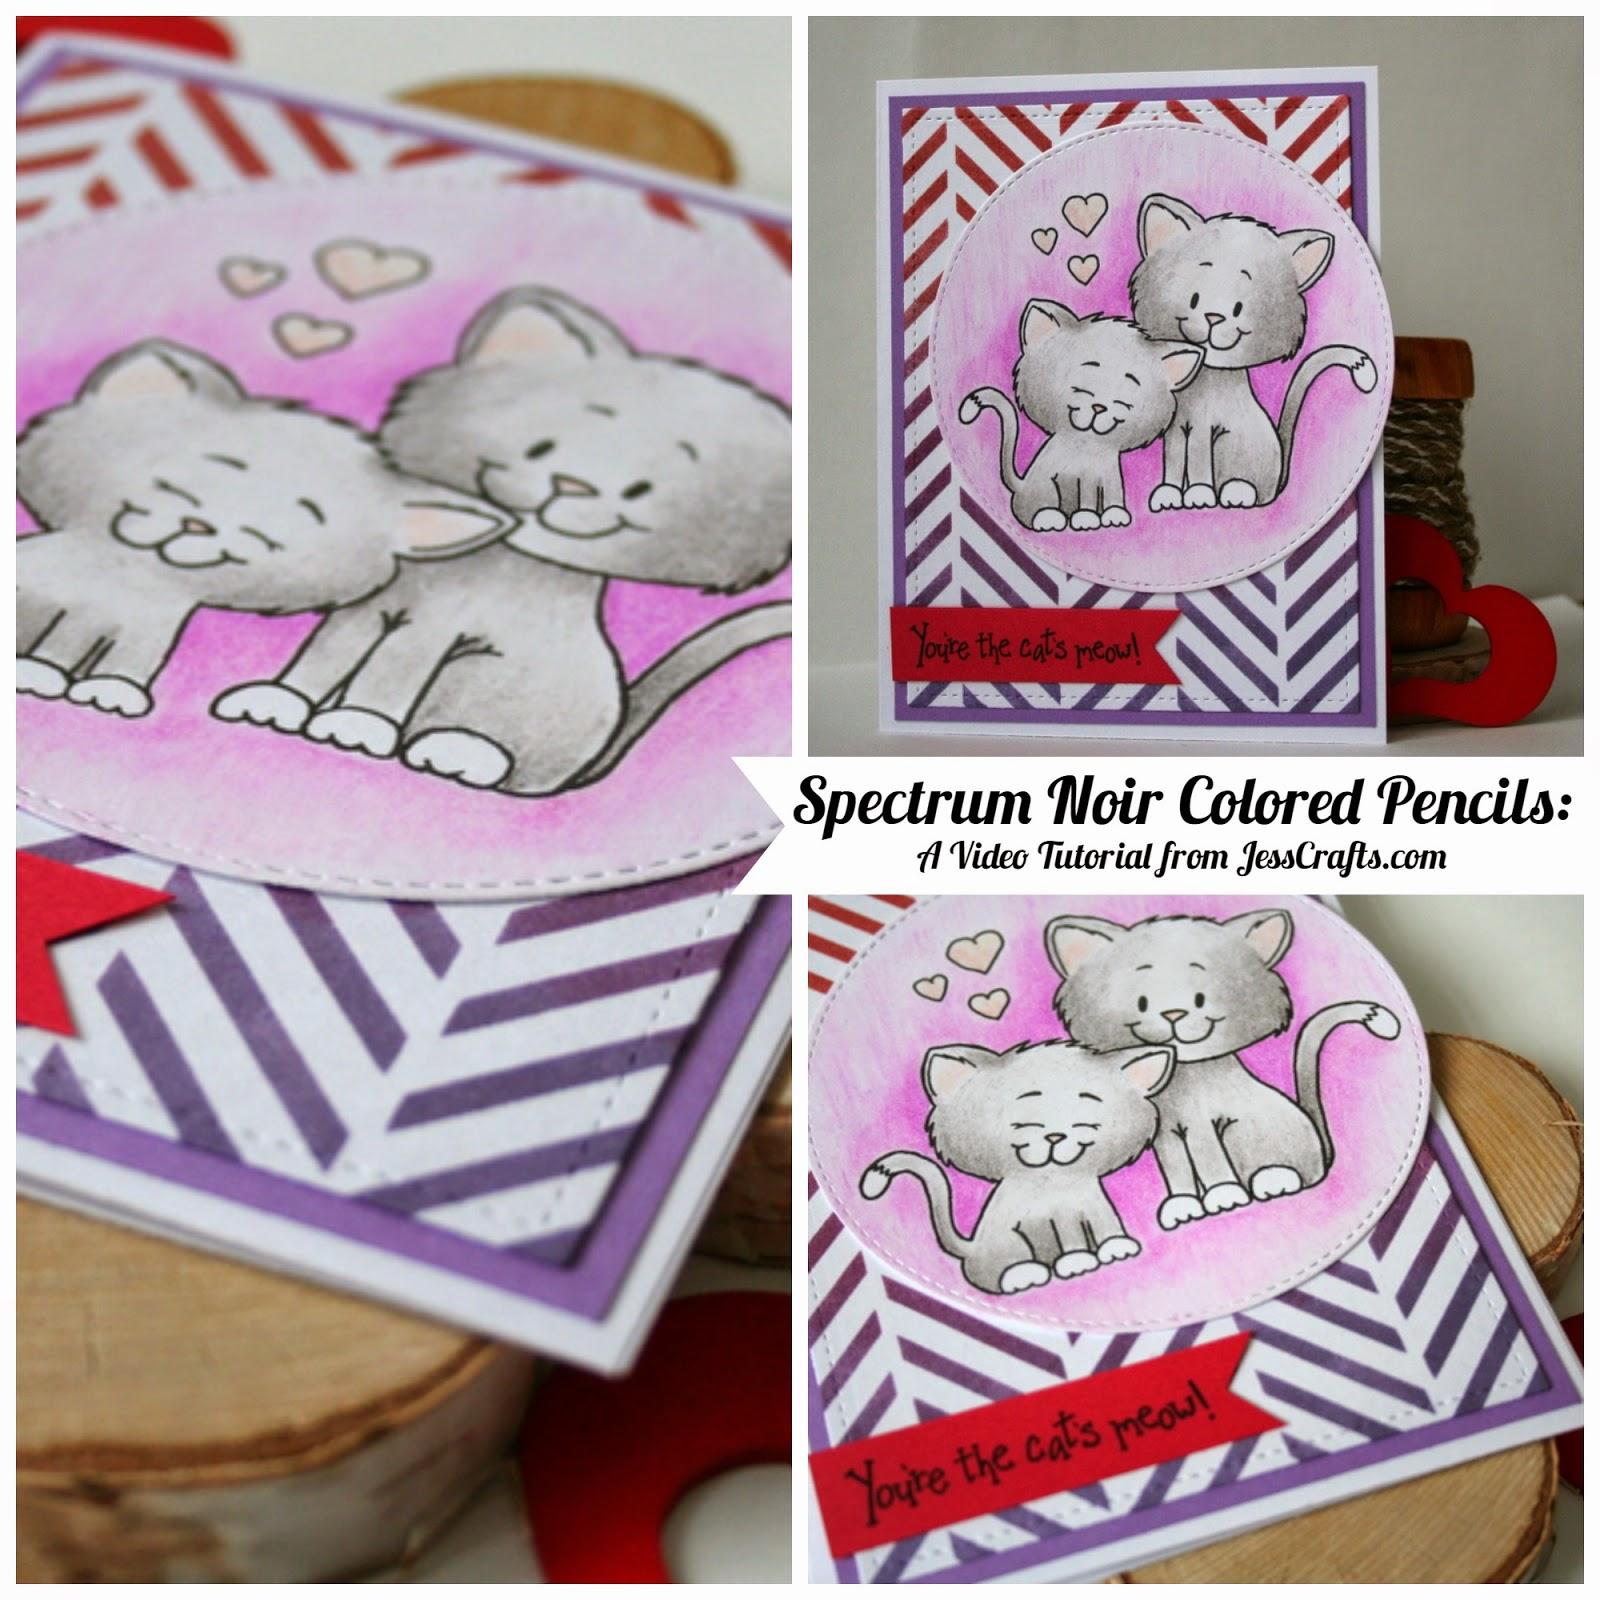 Cat Valentine Card by Jess Moyer with Spectrum Noir Colored Pencils Stencils and Gerda Steiner Digital Stamp